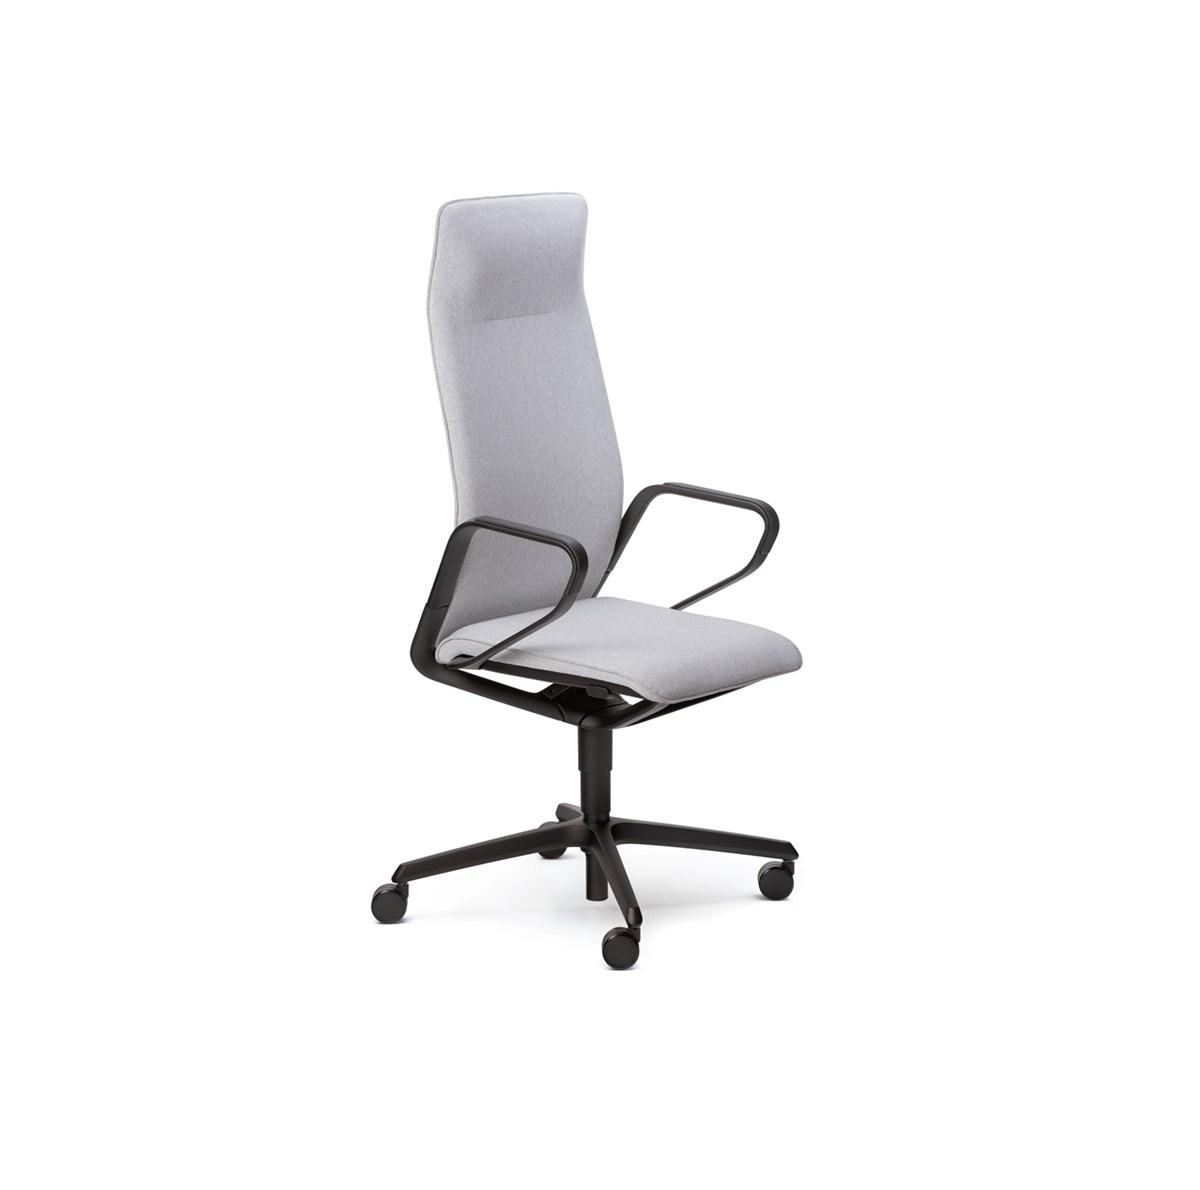 Sedus-Se:line-Meeting-Chair-Matisse-1